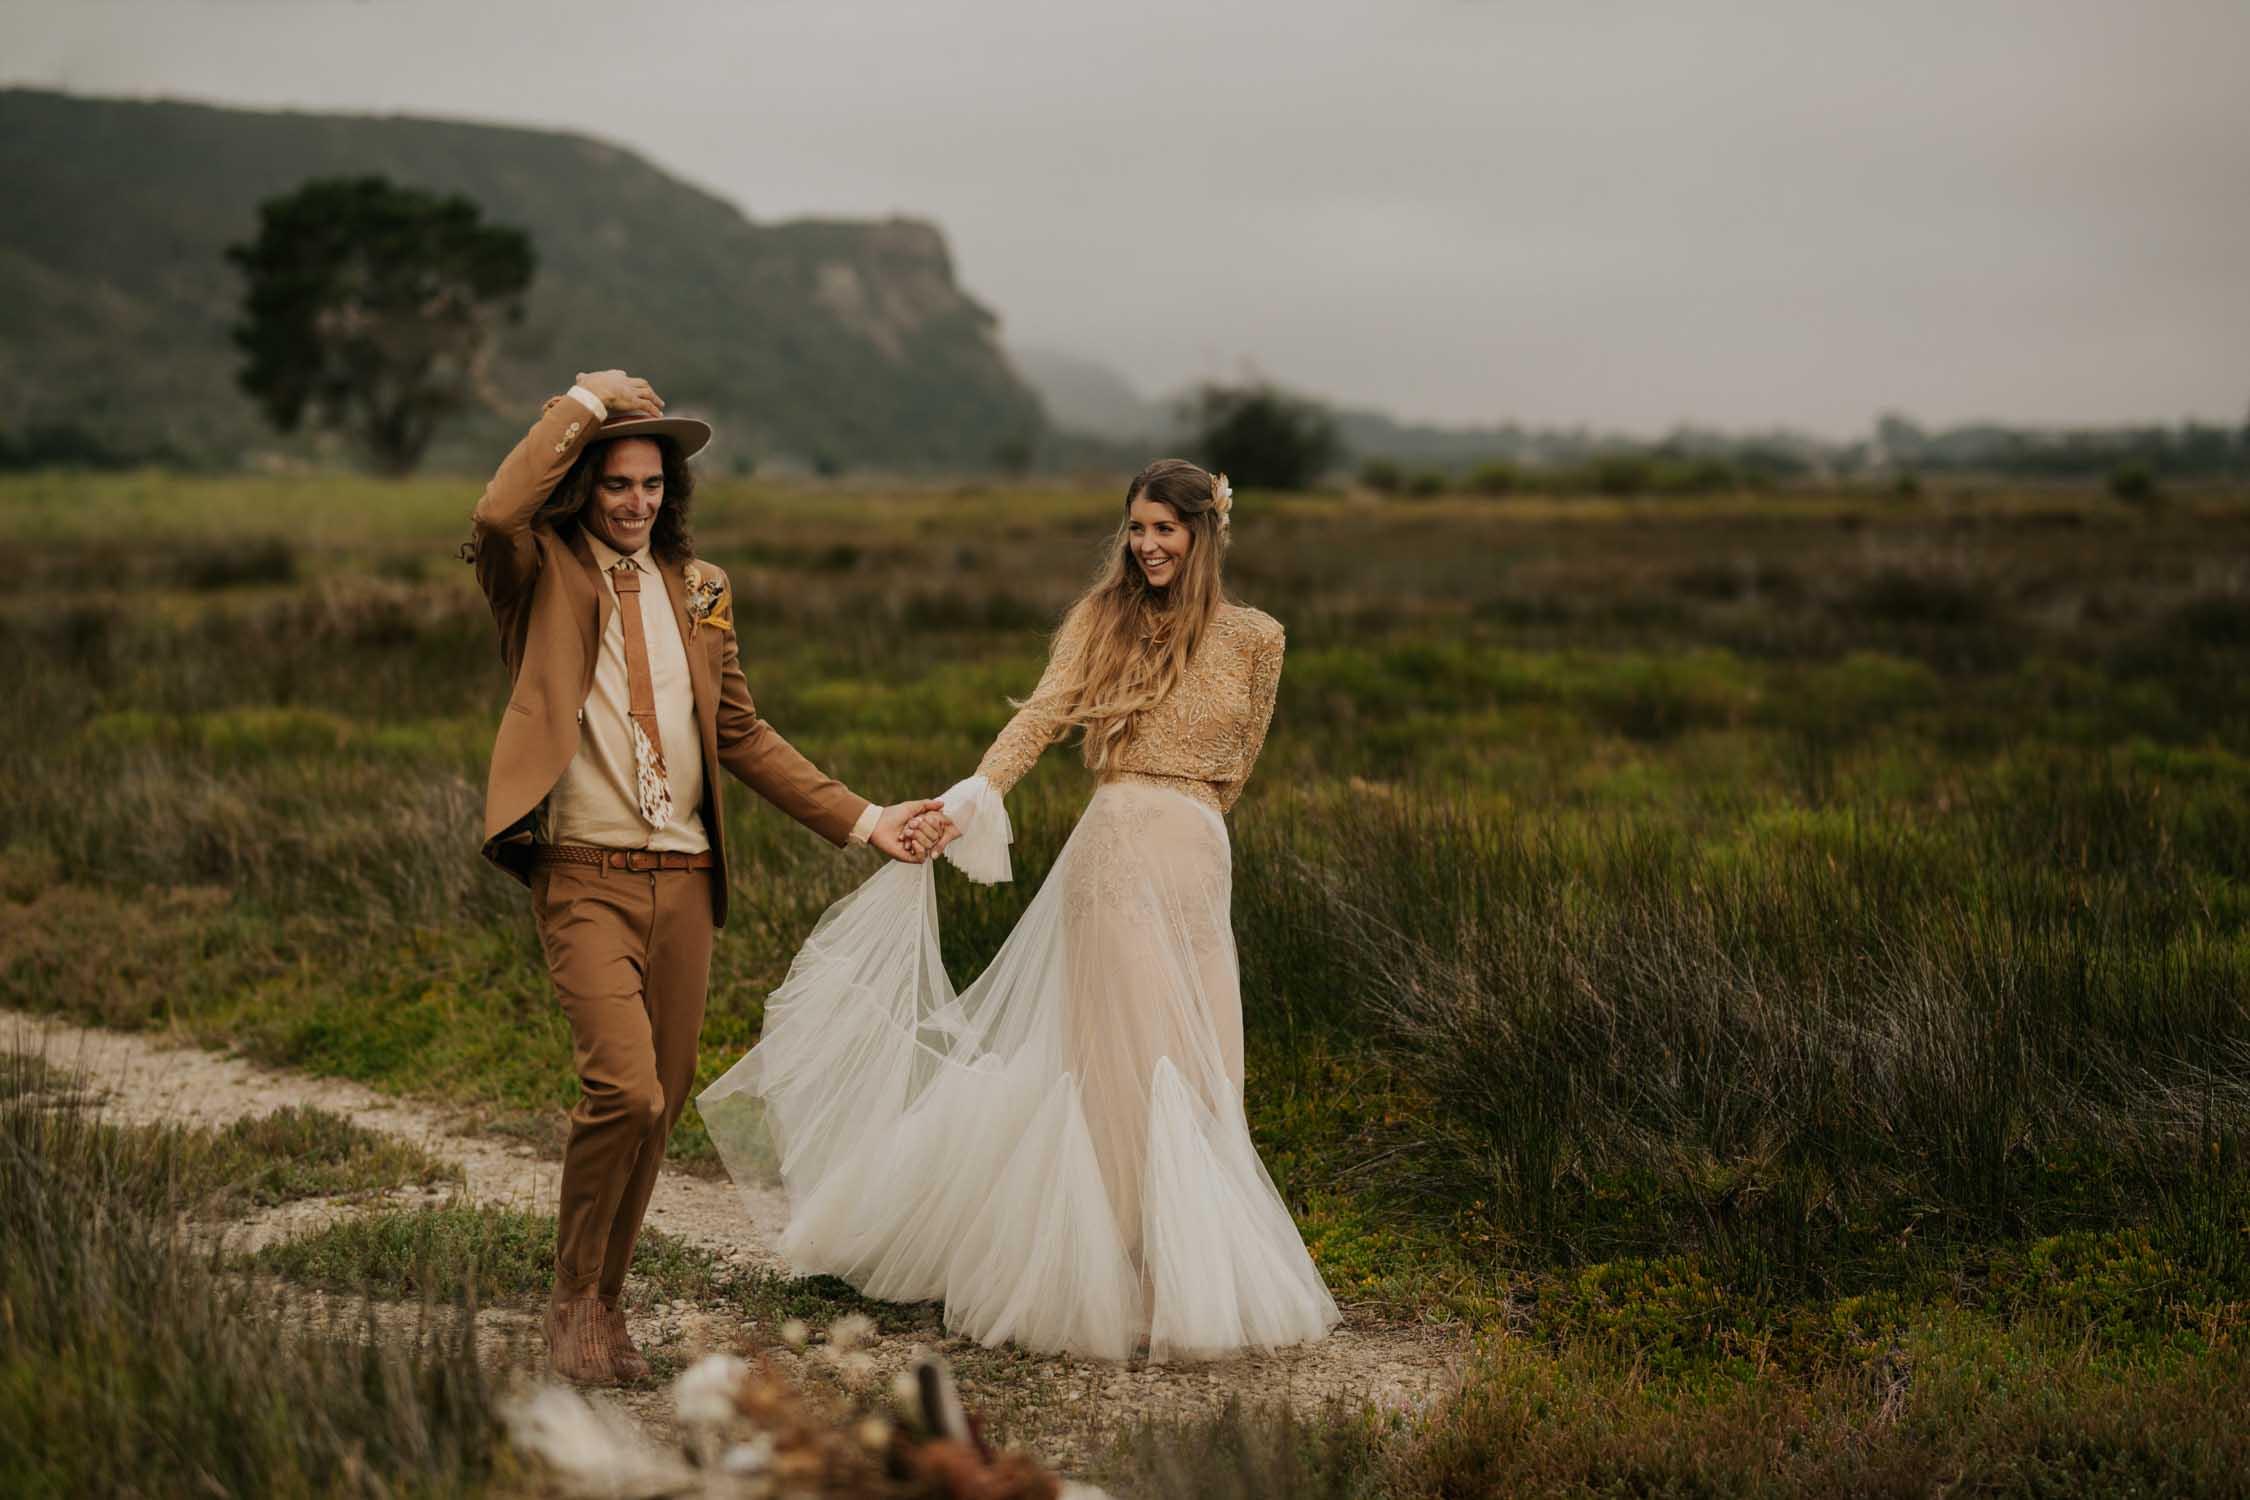 Photojournalistic Vancouver Wedding Photographer takes amazing romantic photo of boho bride and groom